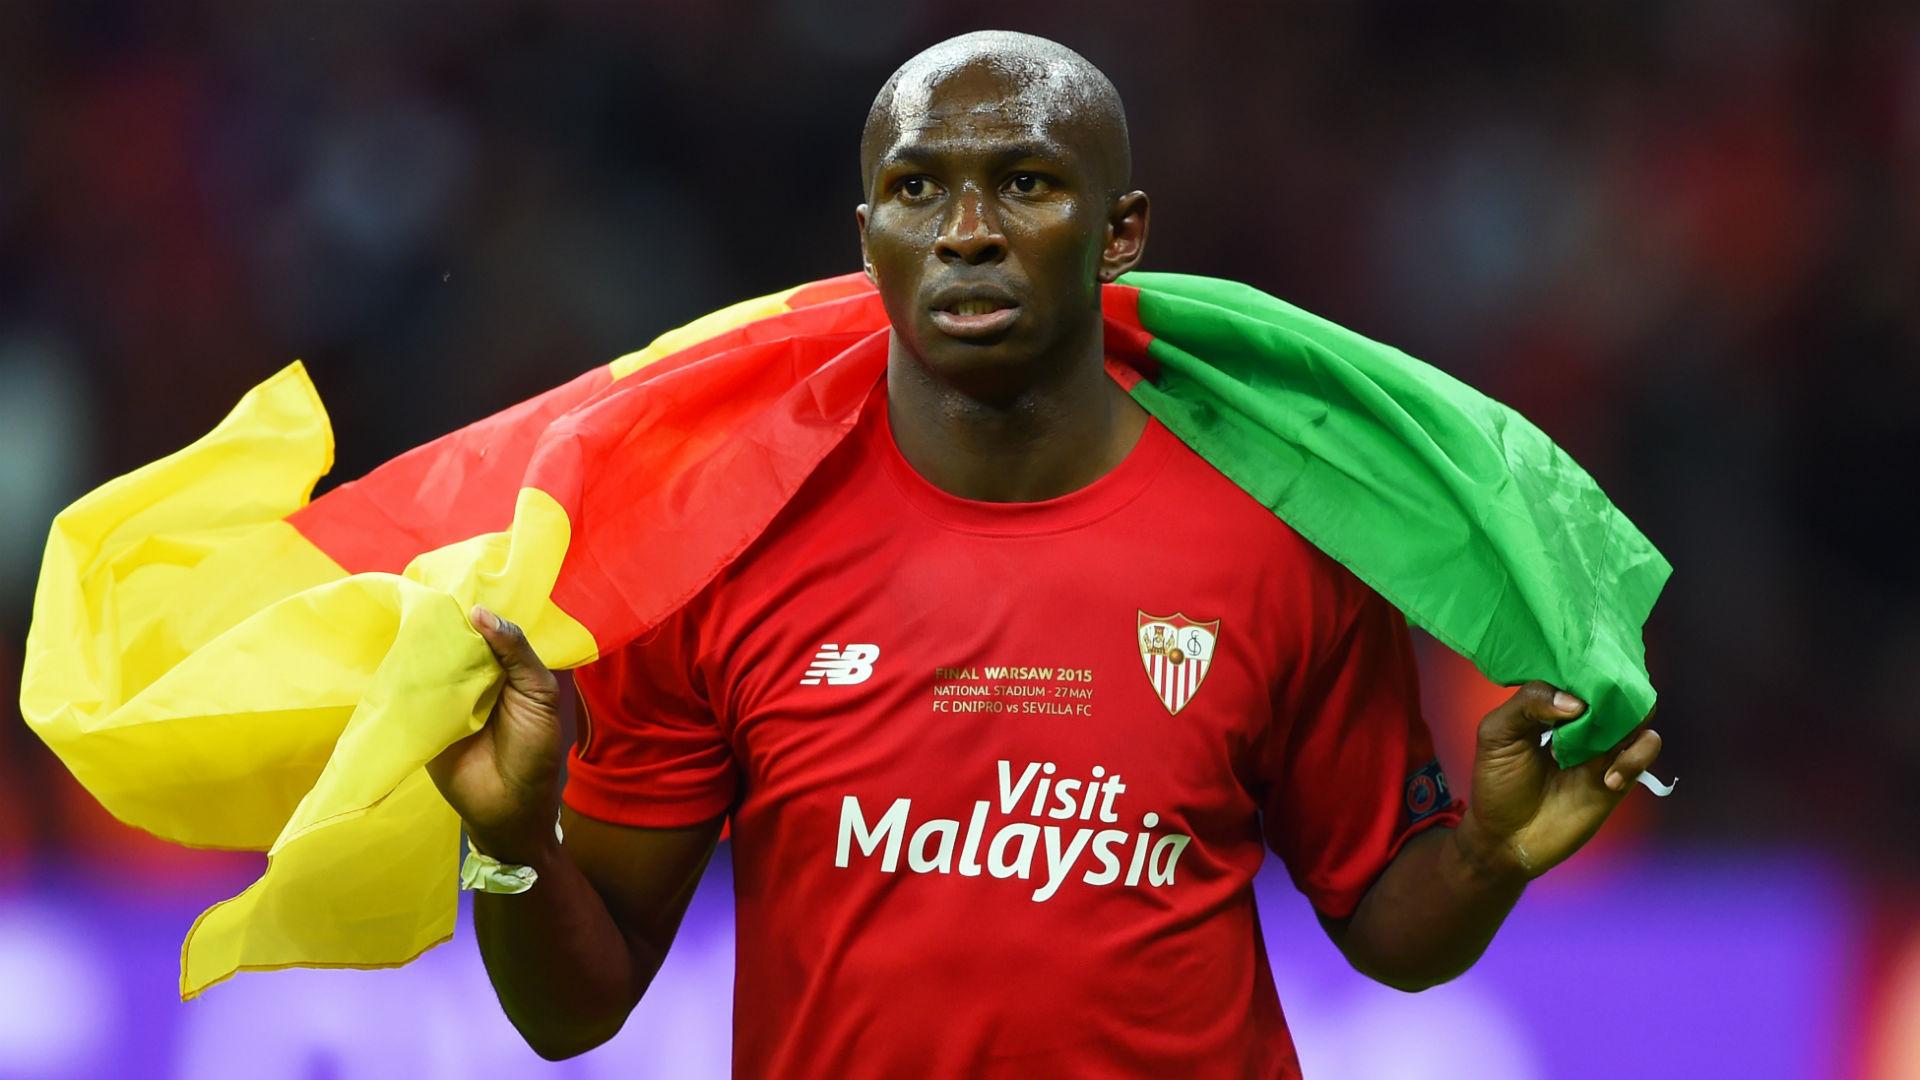 Mbia: Shanghai Shenhua sign Cameroon midfielder on a free transfer